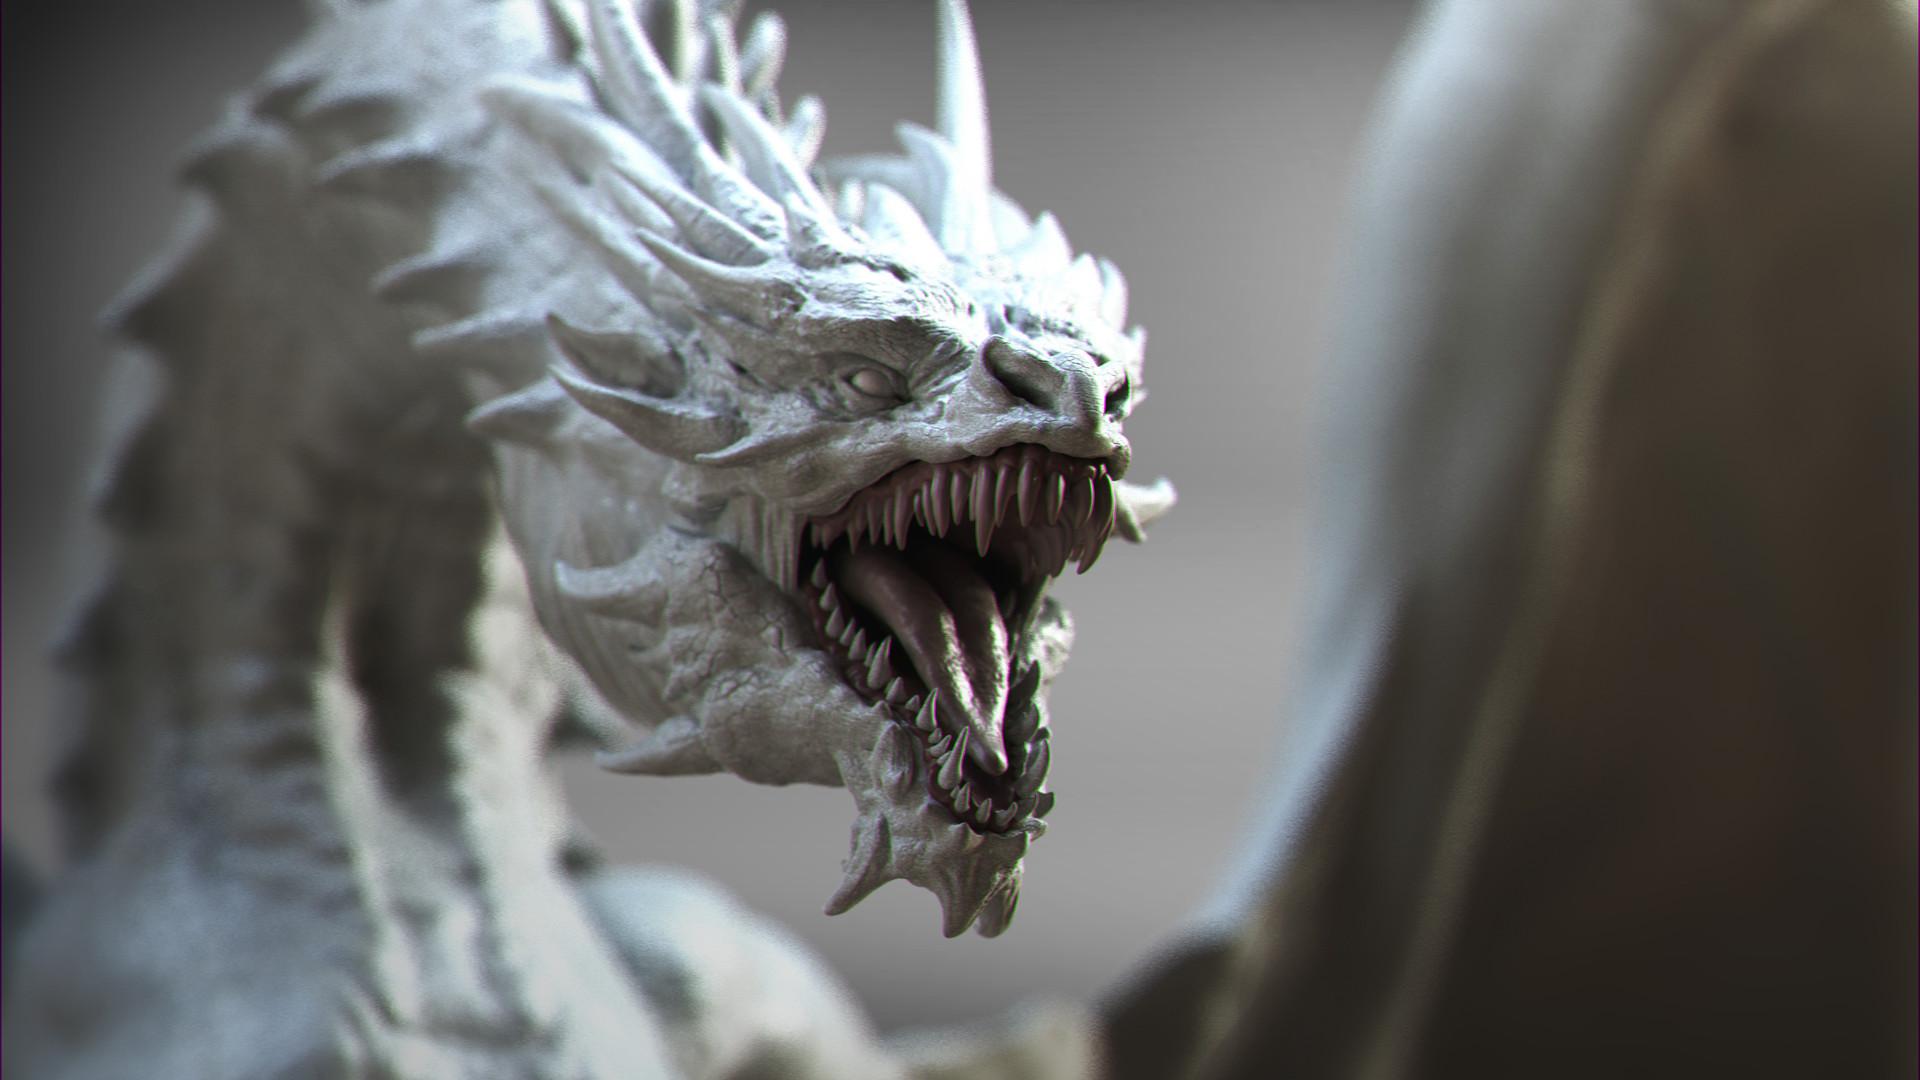 keita okada, Digital sculptor – Dragon